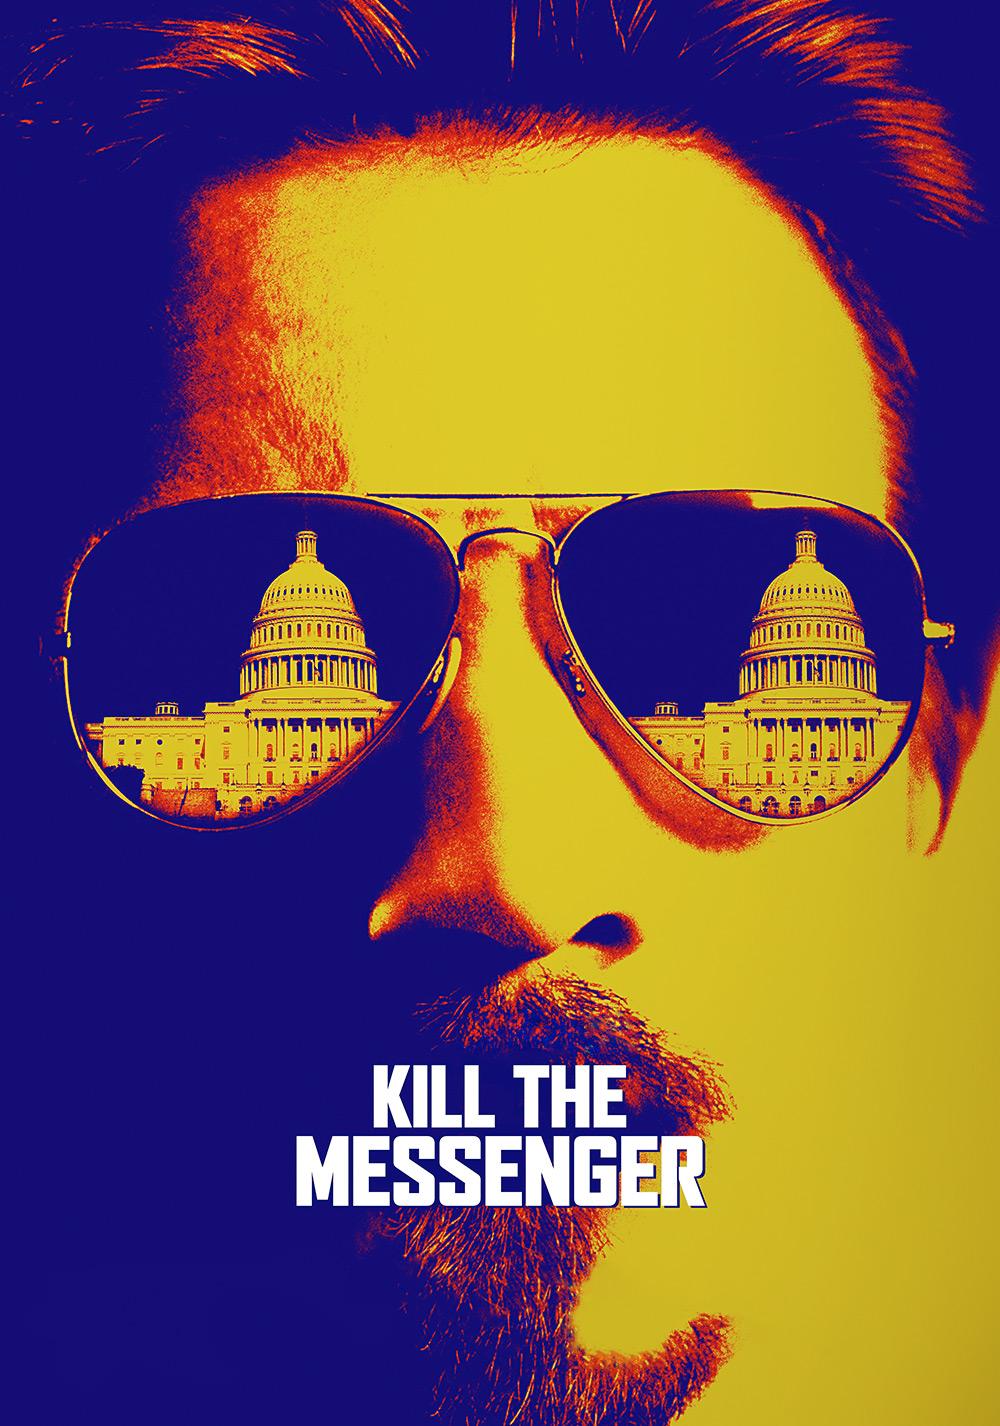 kill-the-messenger-54b41f5362d9a.jpg